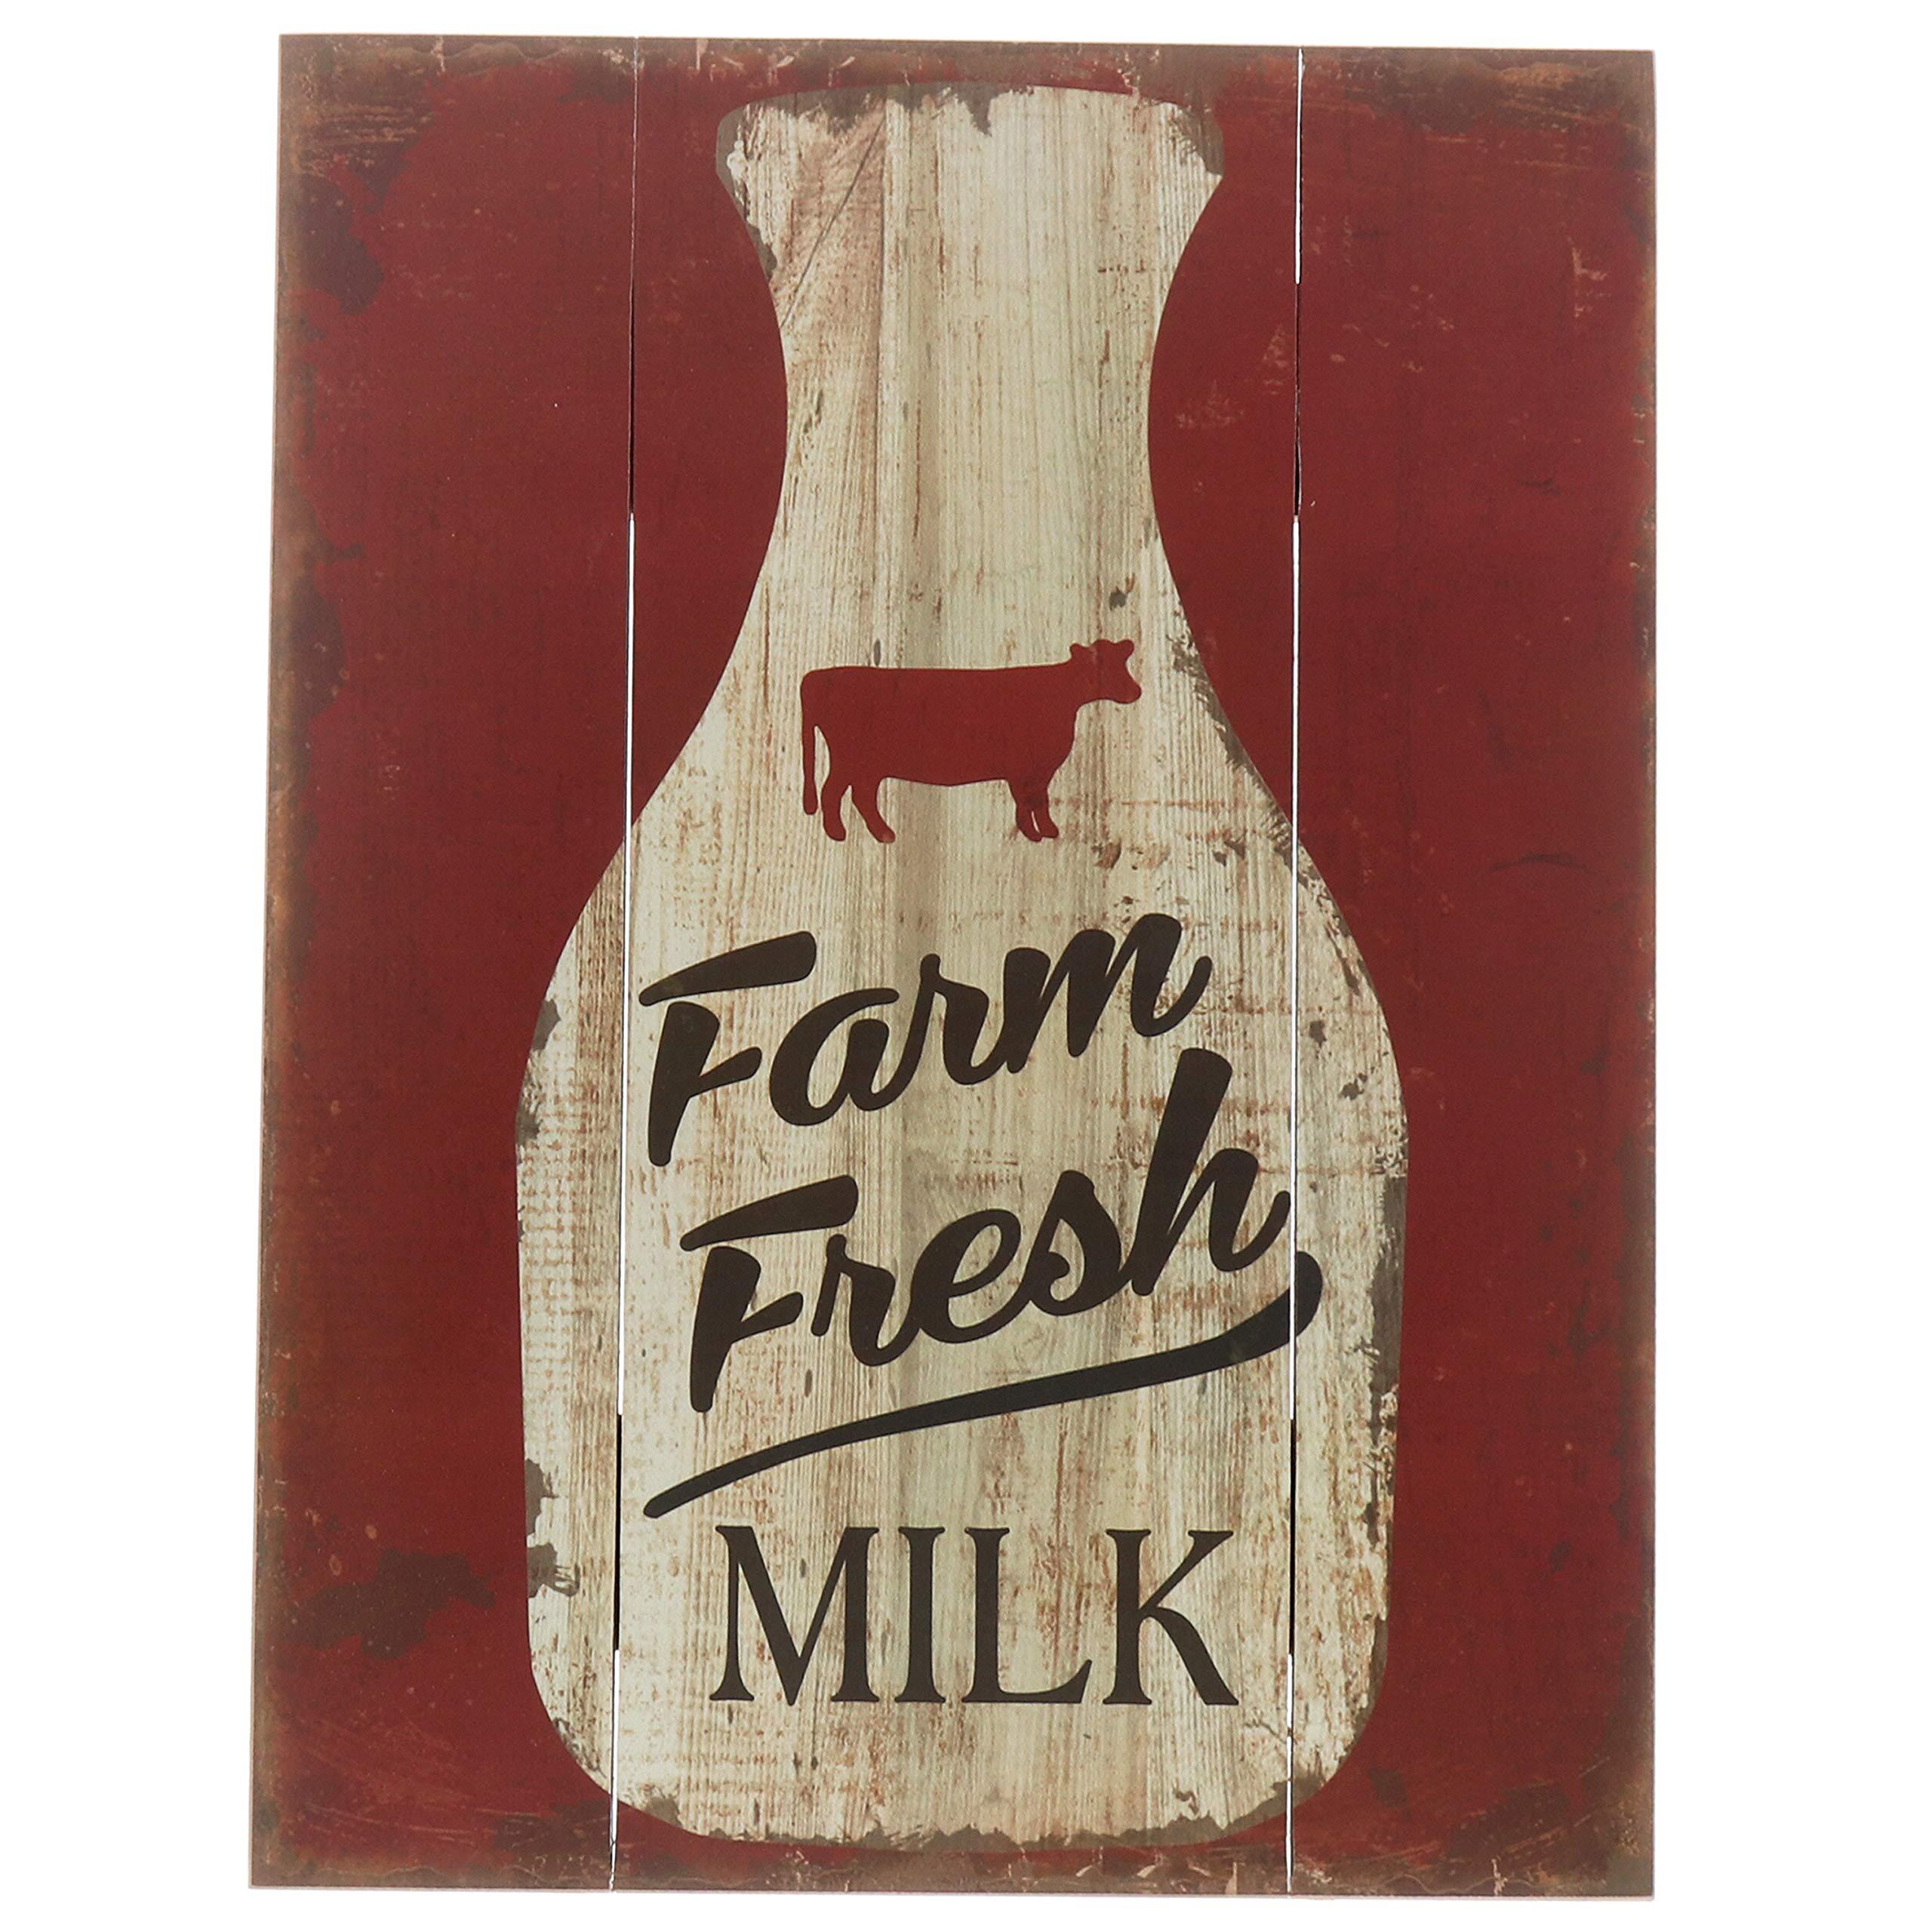 Barnyard Designs Farm Fresh Milk Retro Vintage Wood Plaque Bar Sign Country Home Decor 15.75'' x 11.75''